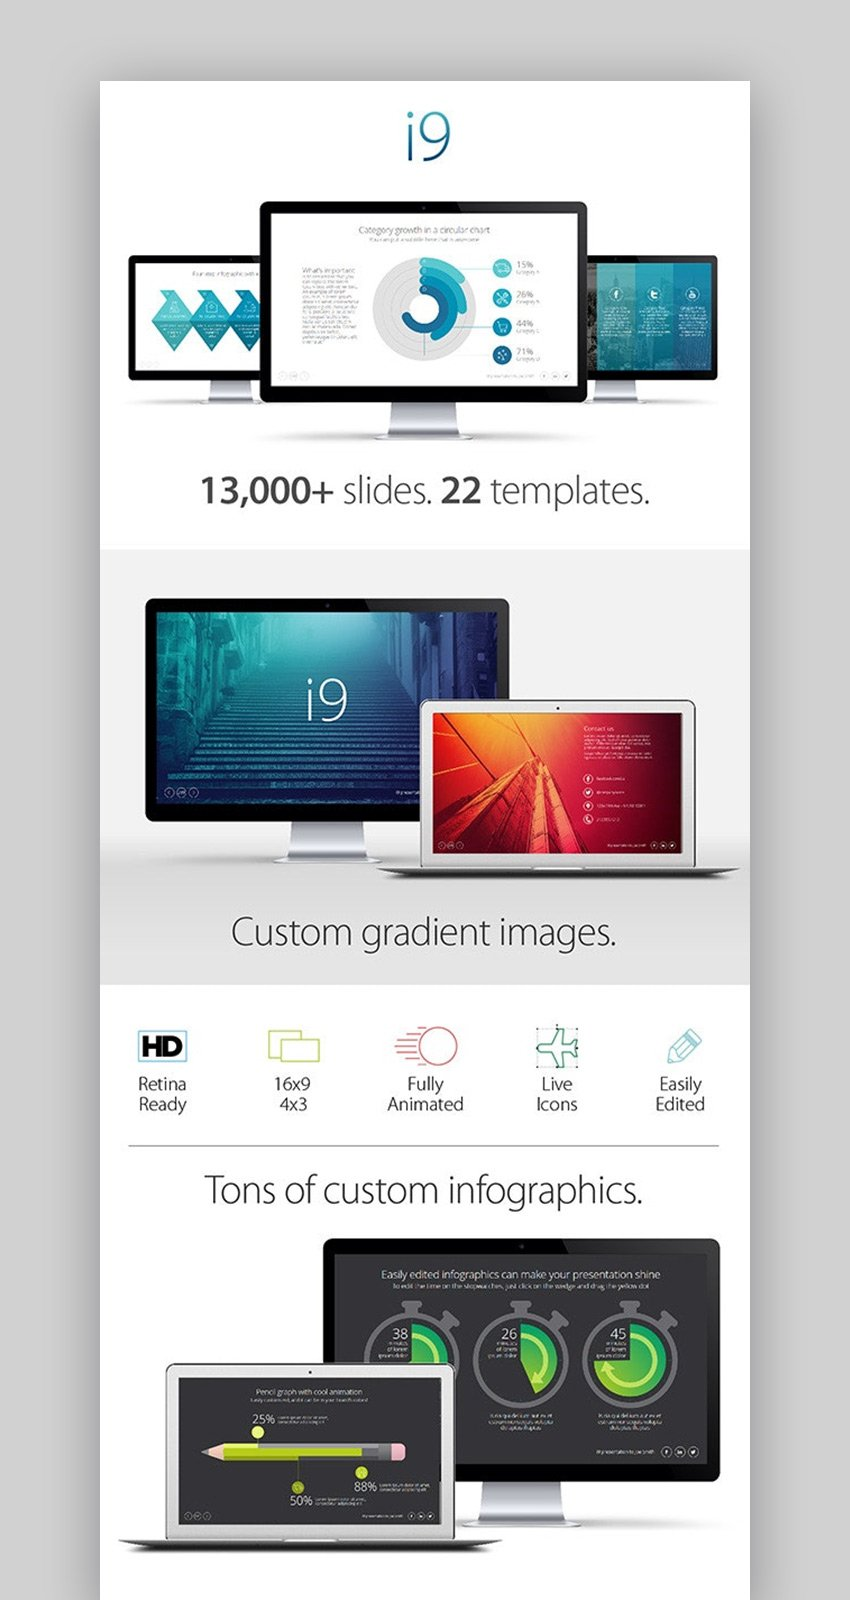 Best PPT Presentation i9 Template